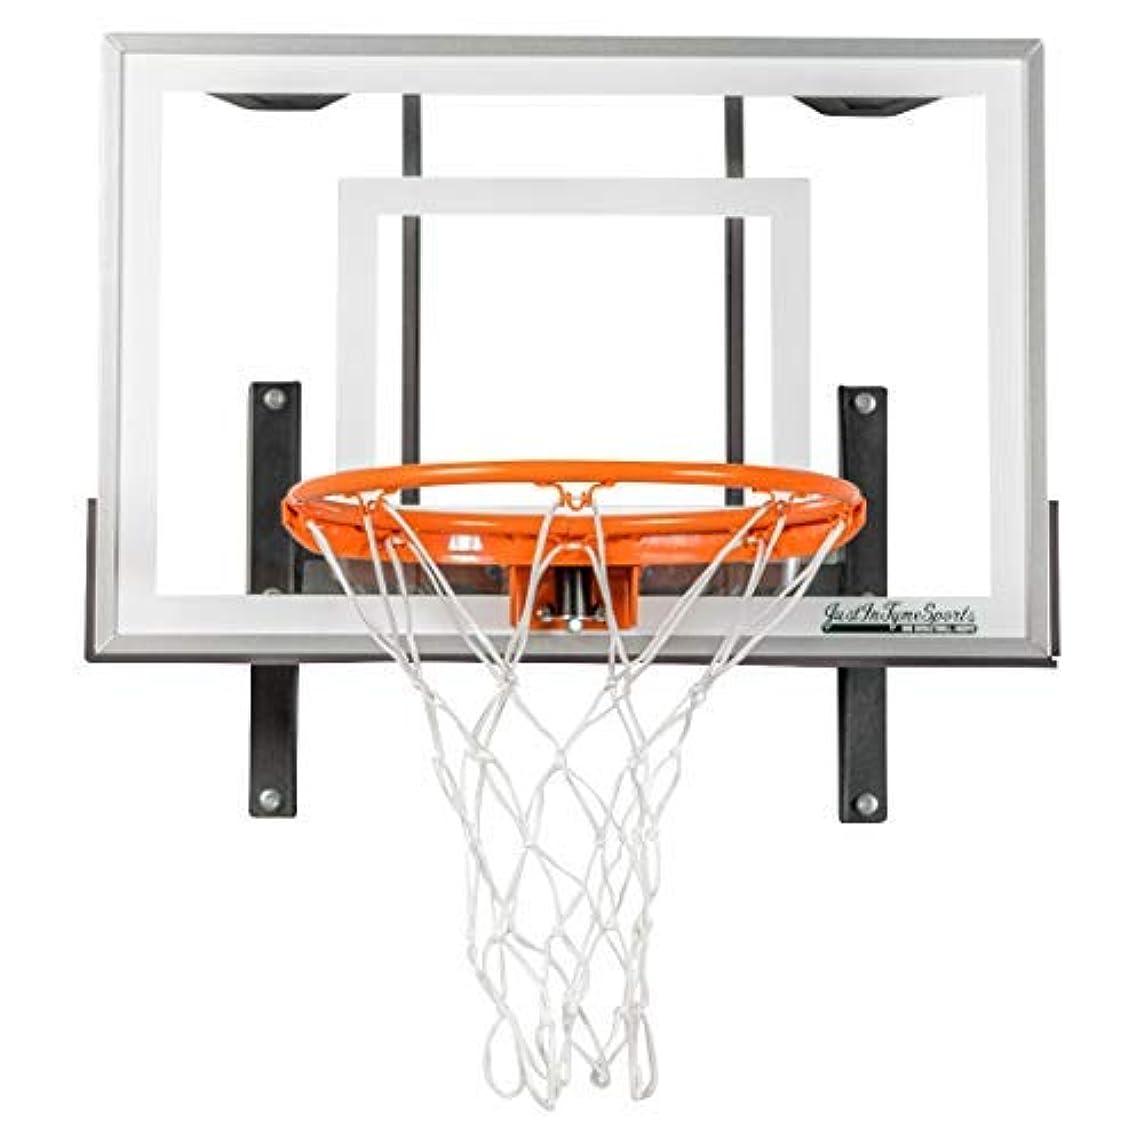 JustInTymeSports Wall Mounted Mini Basketball Hoop - Mini Pro Xtreme Hoop Set